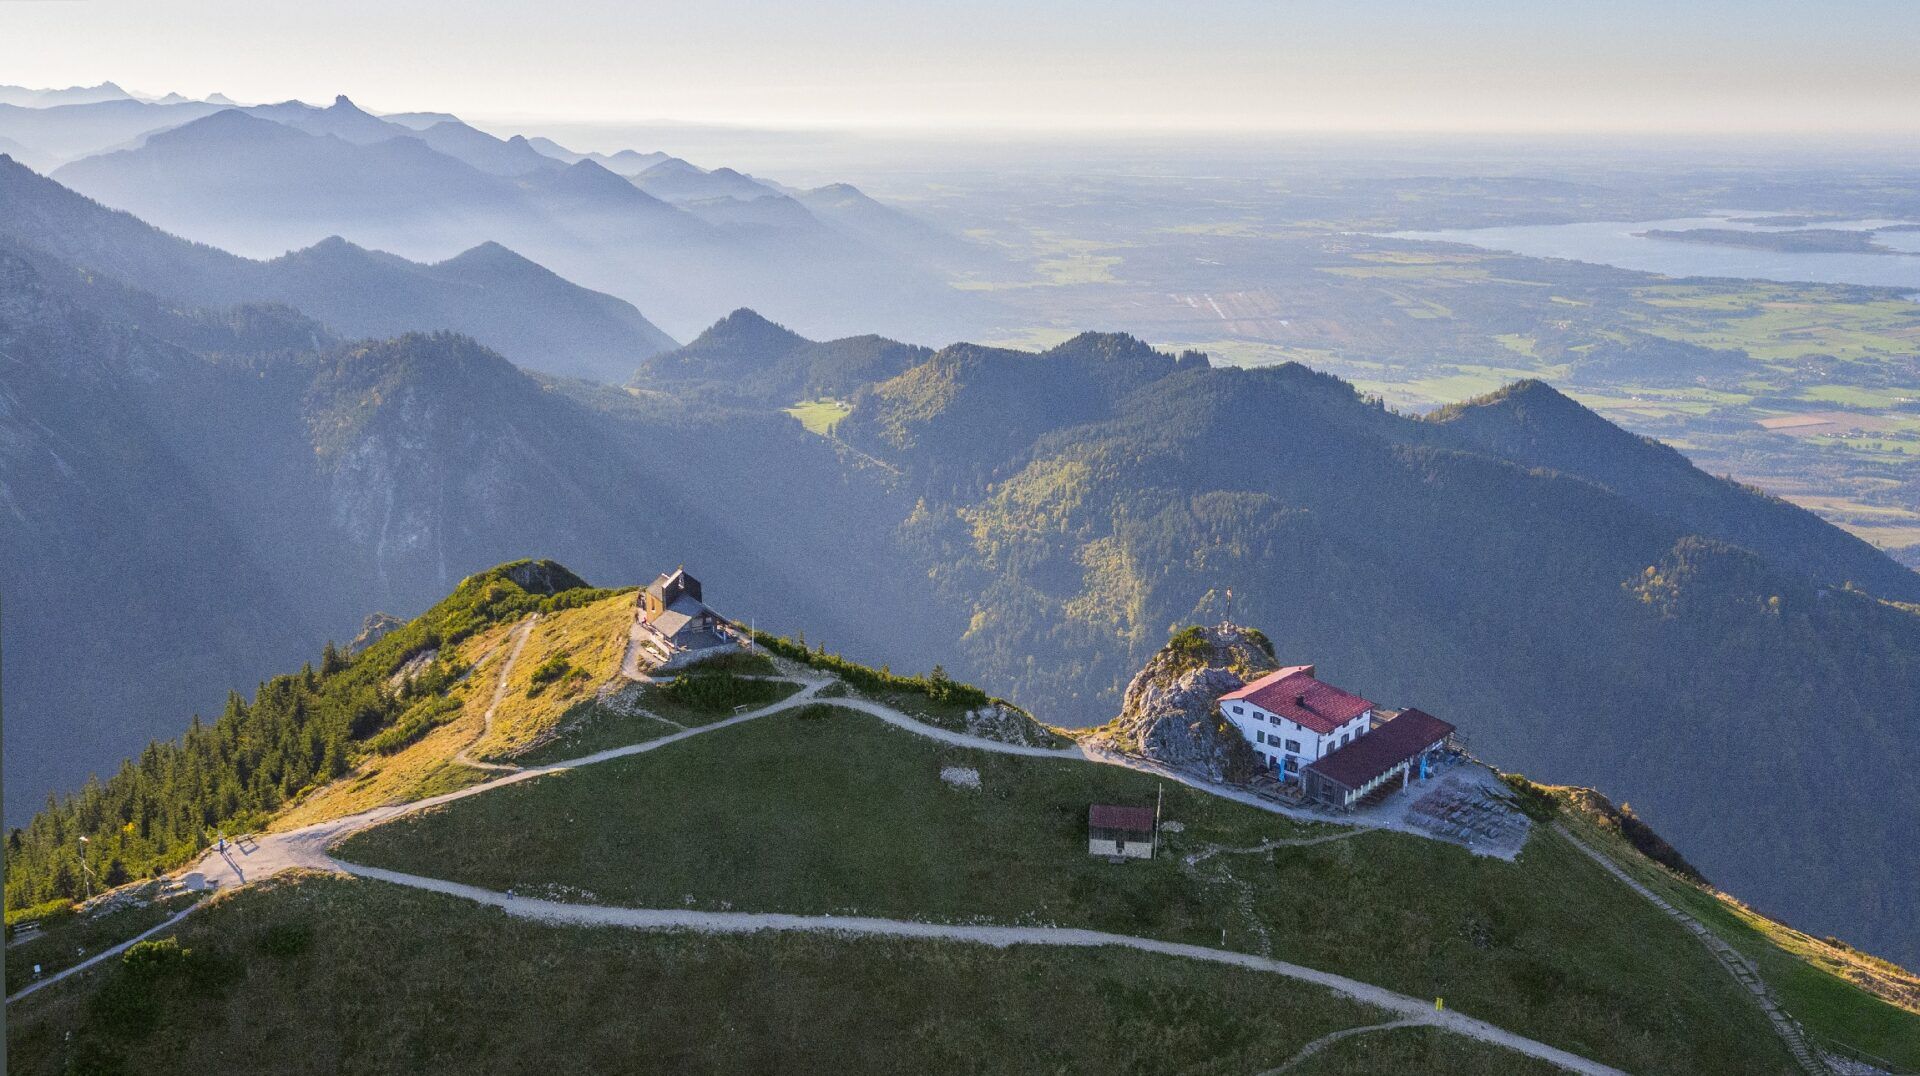 Hochfellngipfel, Hochfellnpanorama, Chiemgauer Alpen